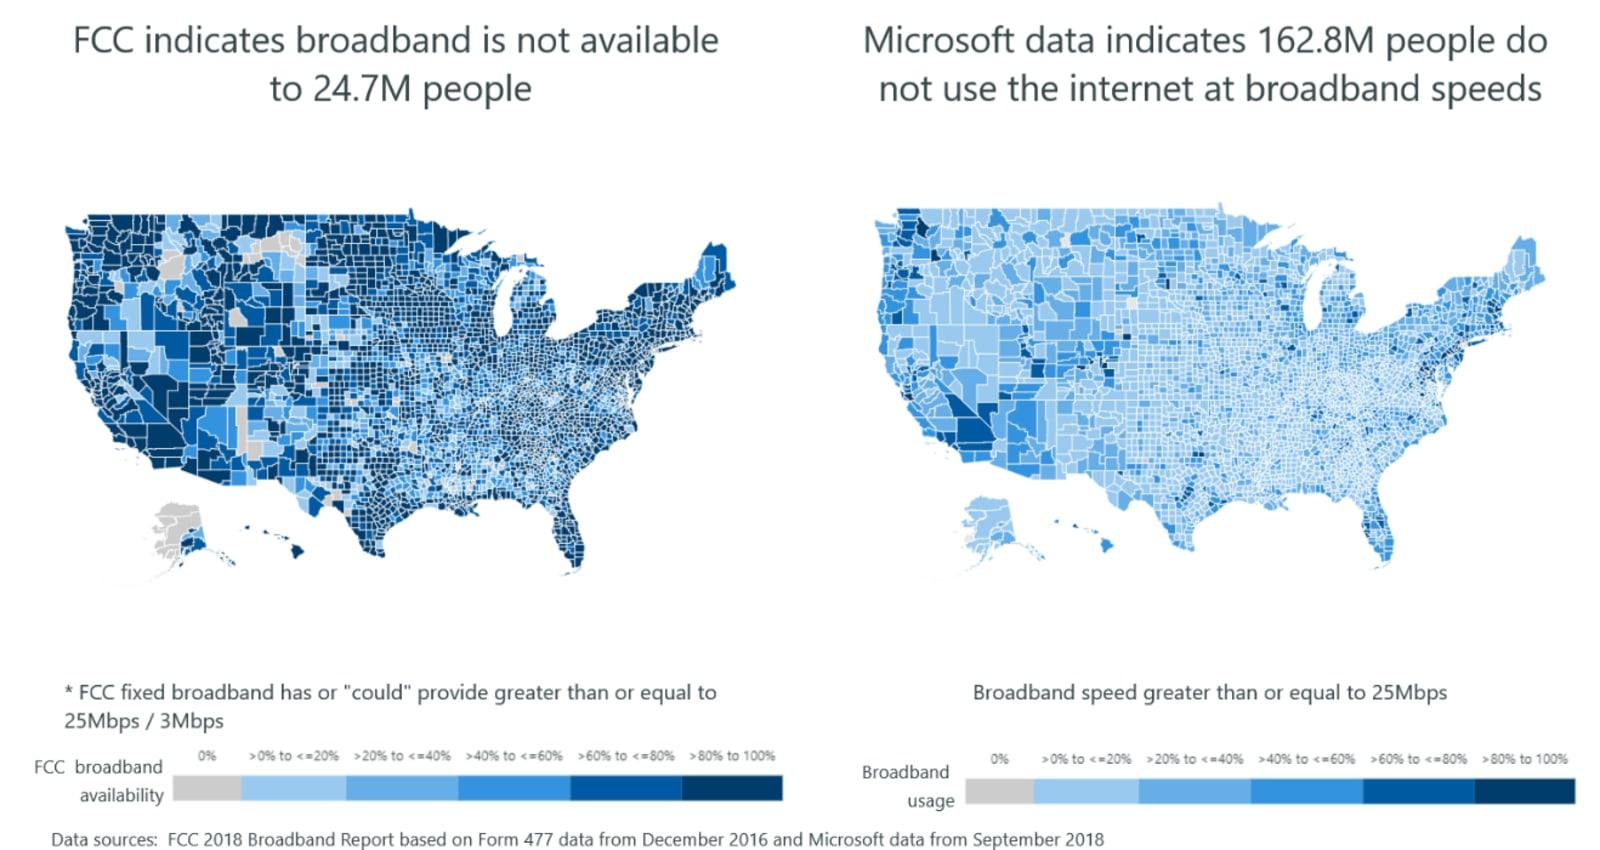 FCC broadband data vs Microsoft broadband data